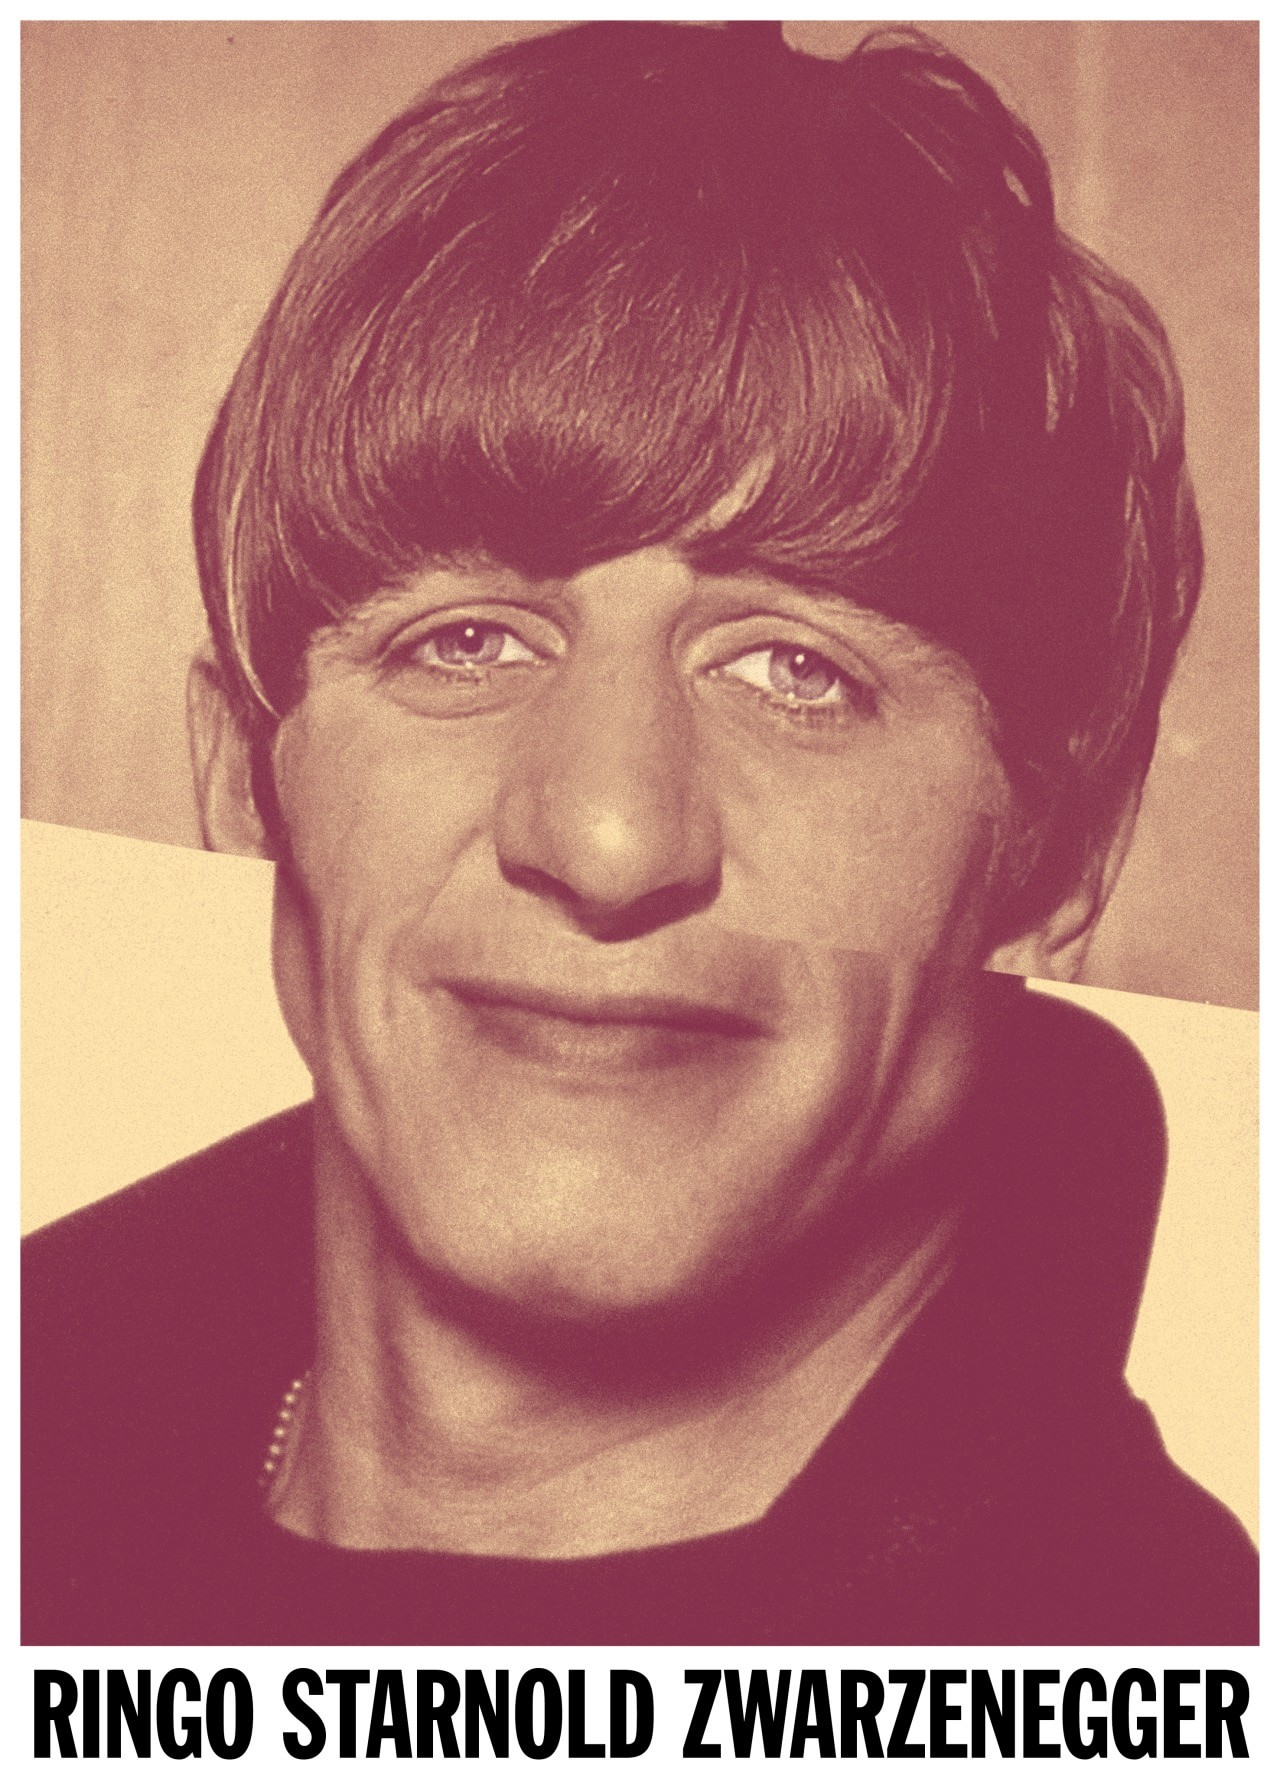 Ringo starnold schwarzenegger